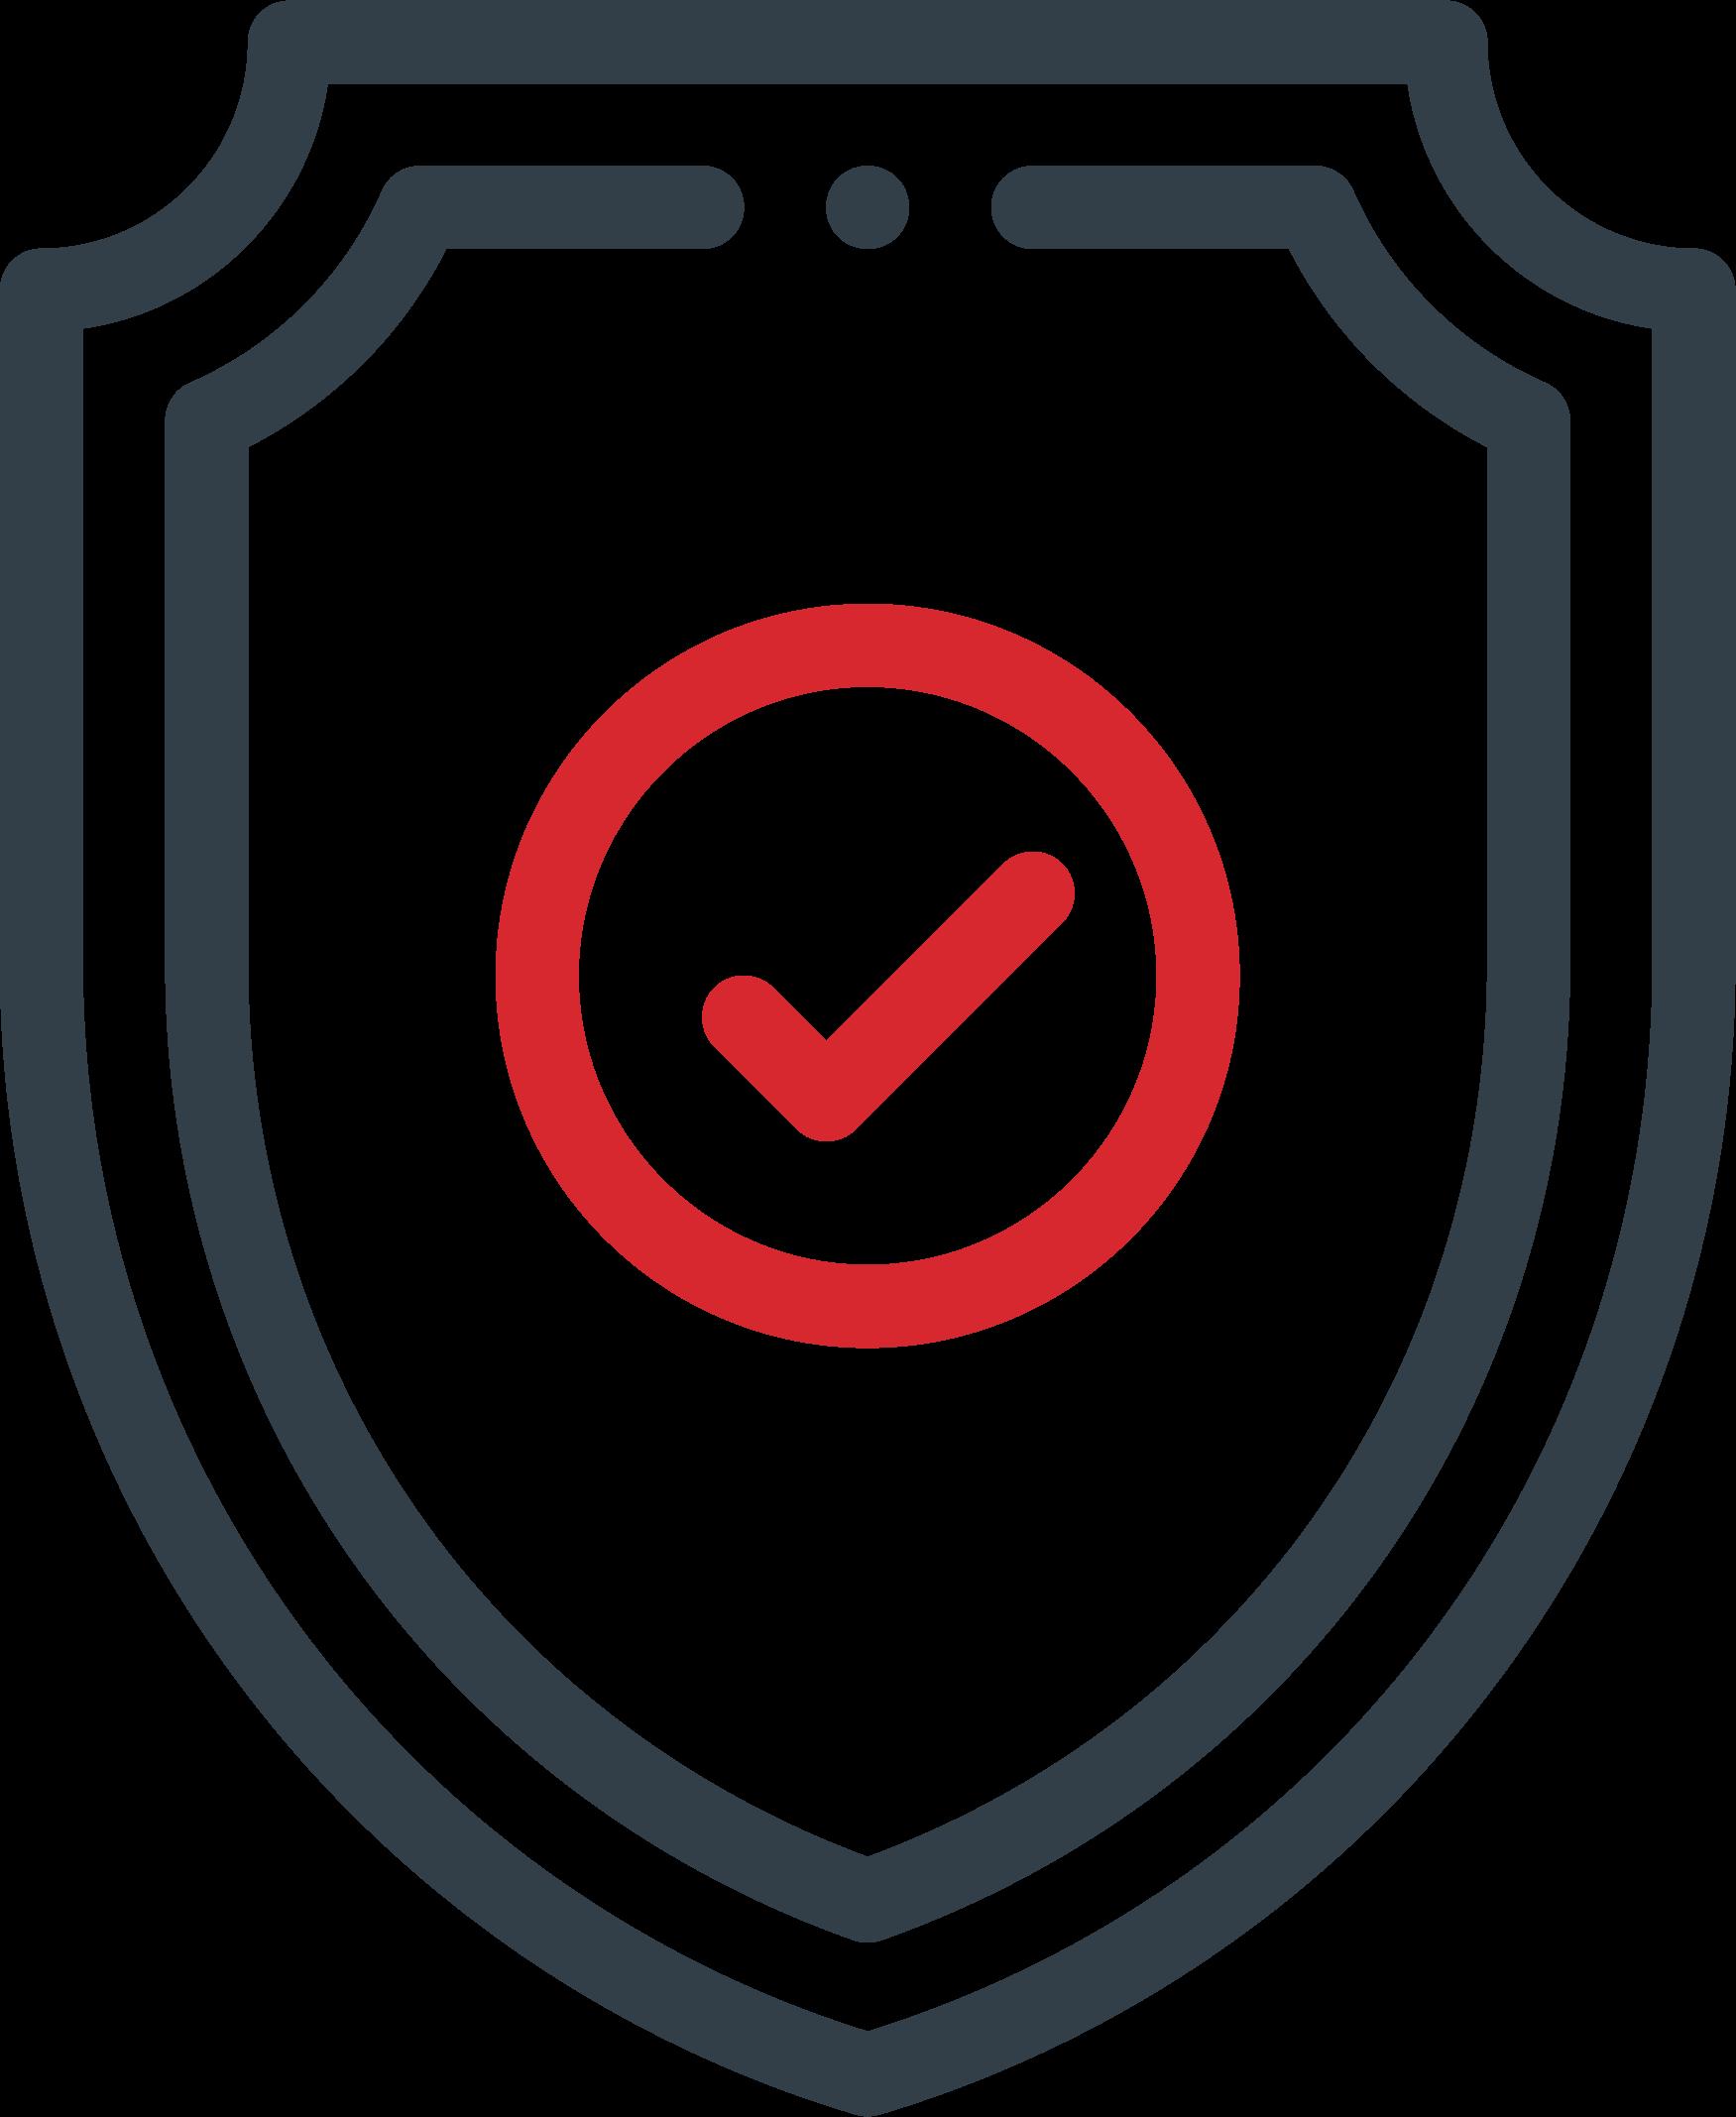 seguridad - Ciberseguridad